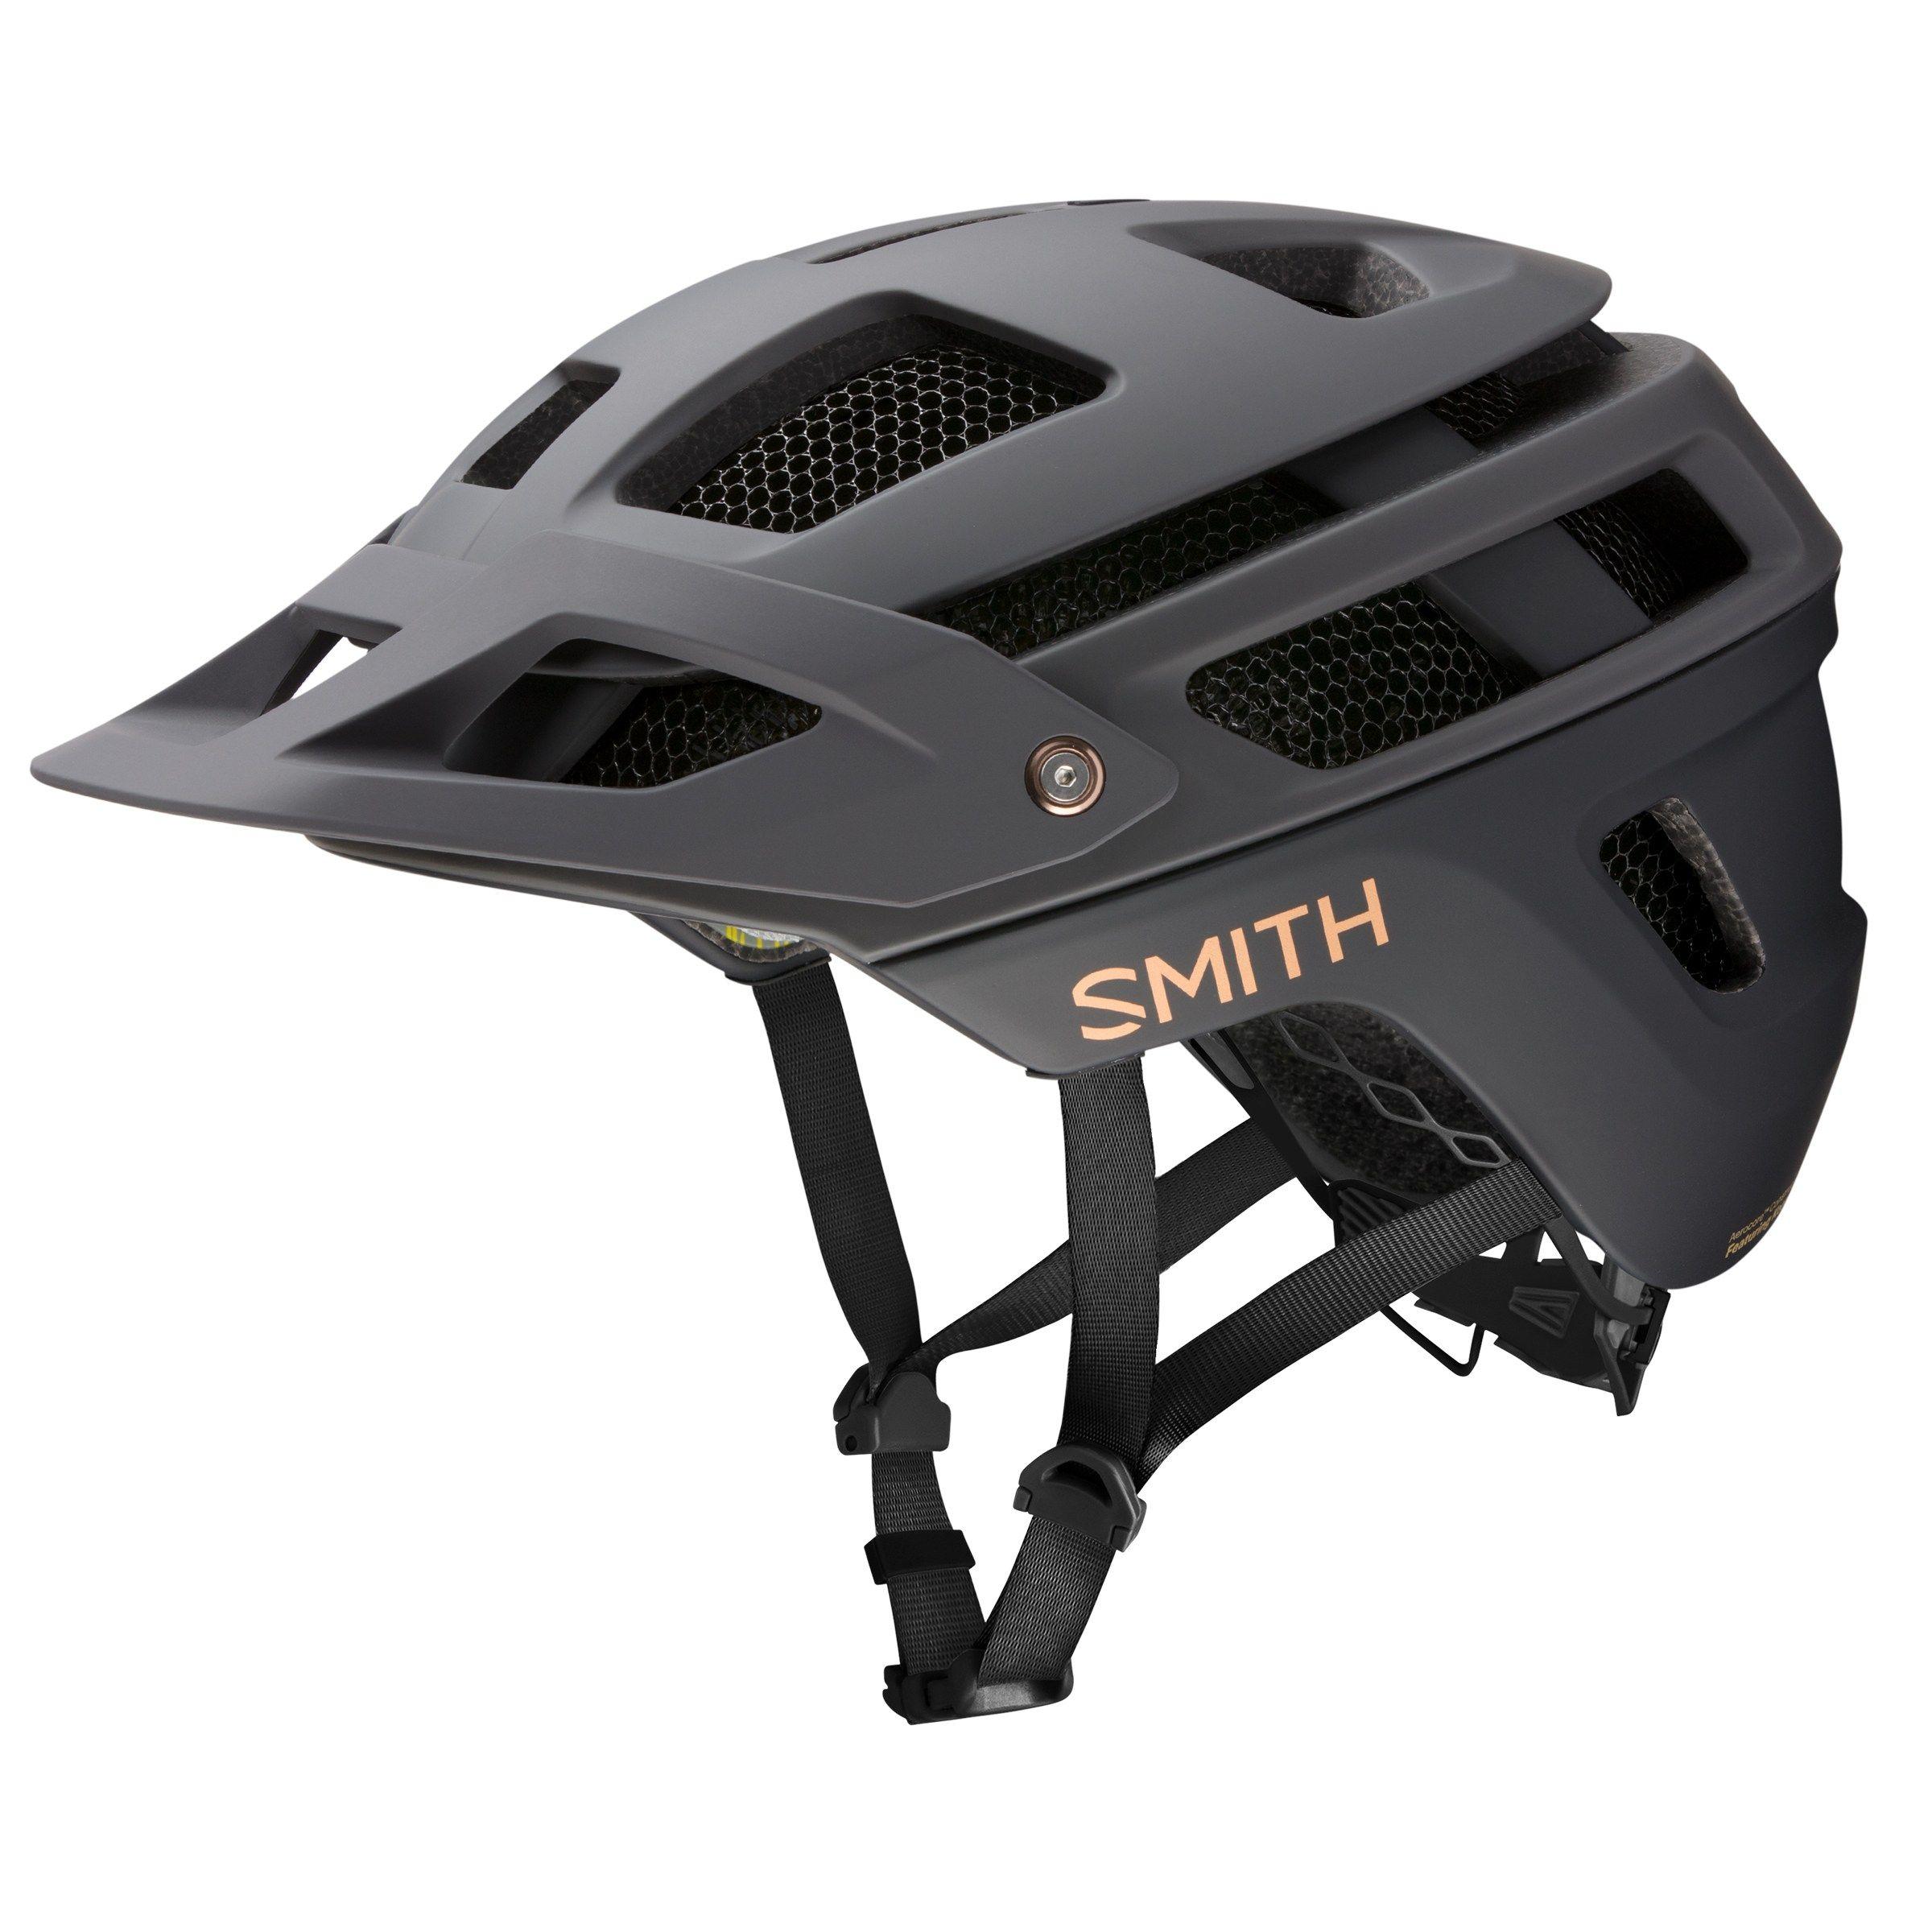 SMITHOPTICS Forefront 2 MIPS HelmetLargeMatte Gravy